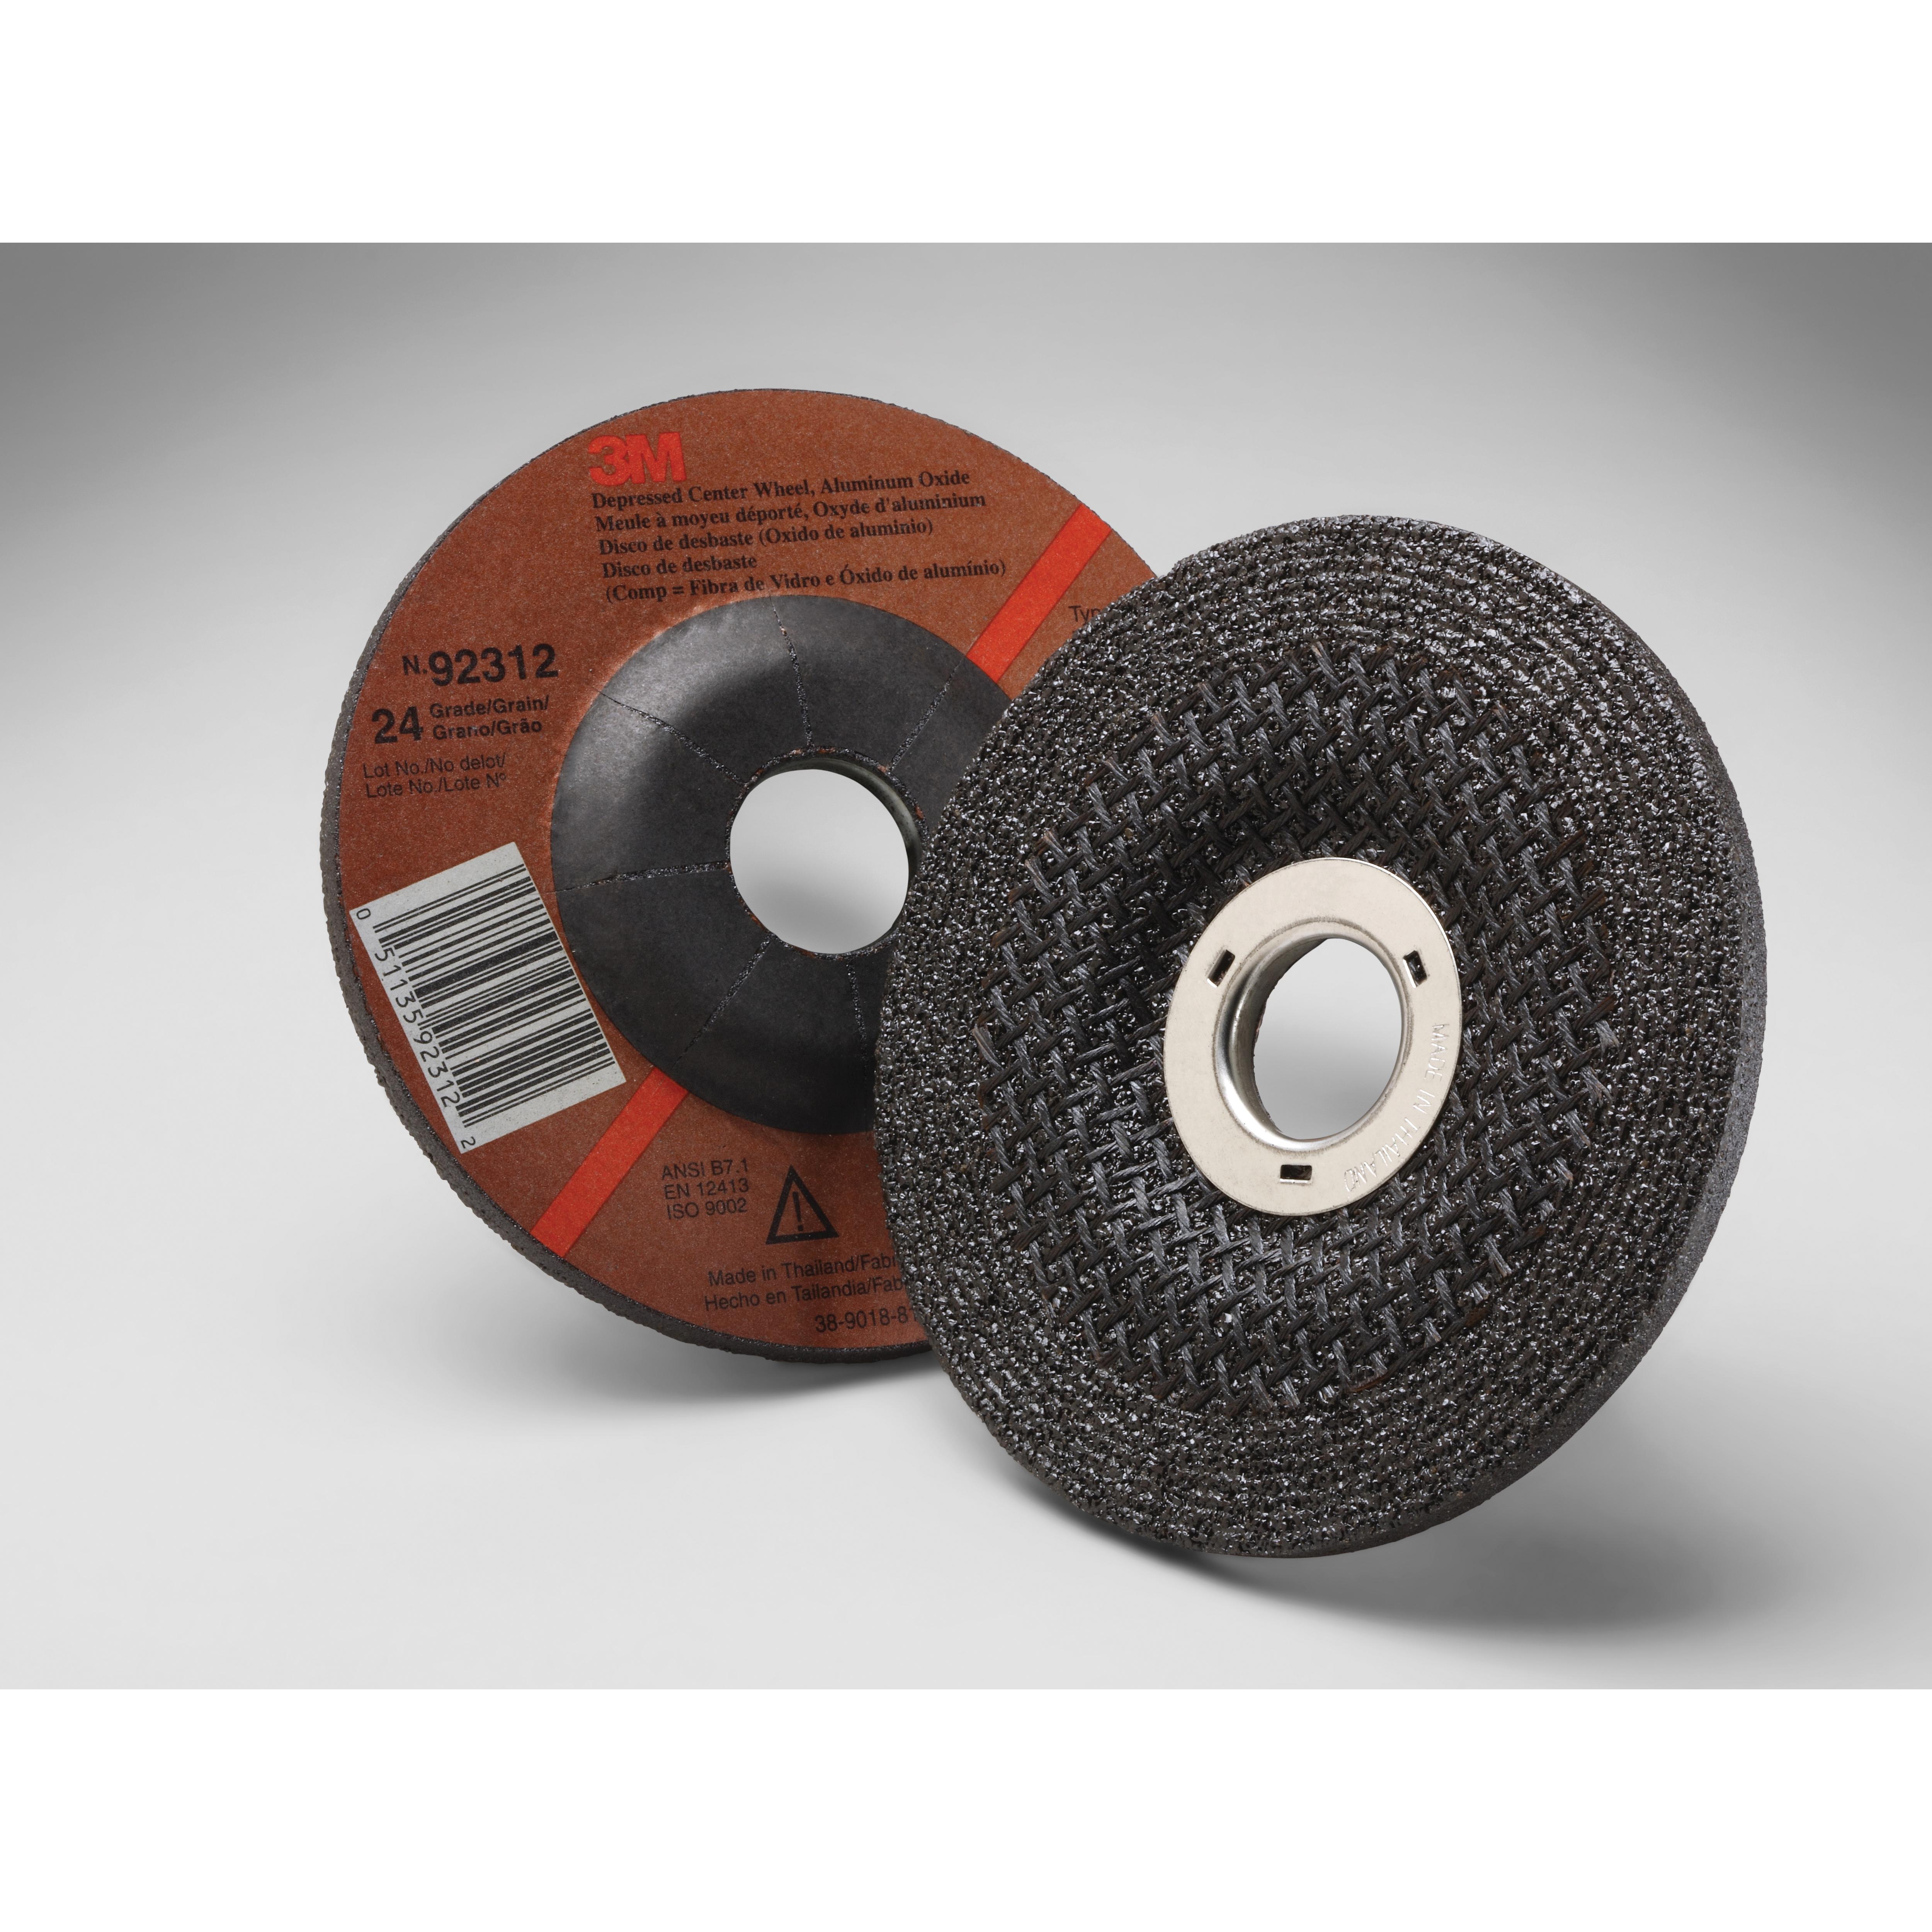 3M™ 051135-92312 General Purpose Depressed Center Wheel, 4-1/2 in Dia x 1/4 in THK, 7/8 in Center Hole, 24 Grit, Aluminum Oxide Abrasive